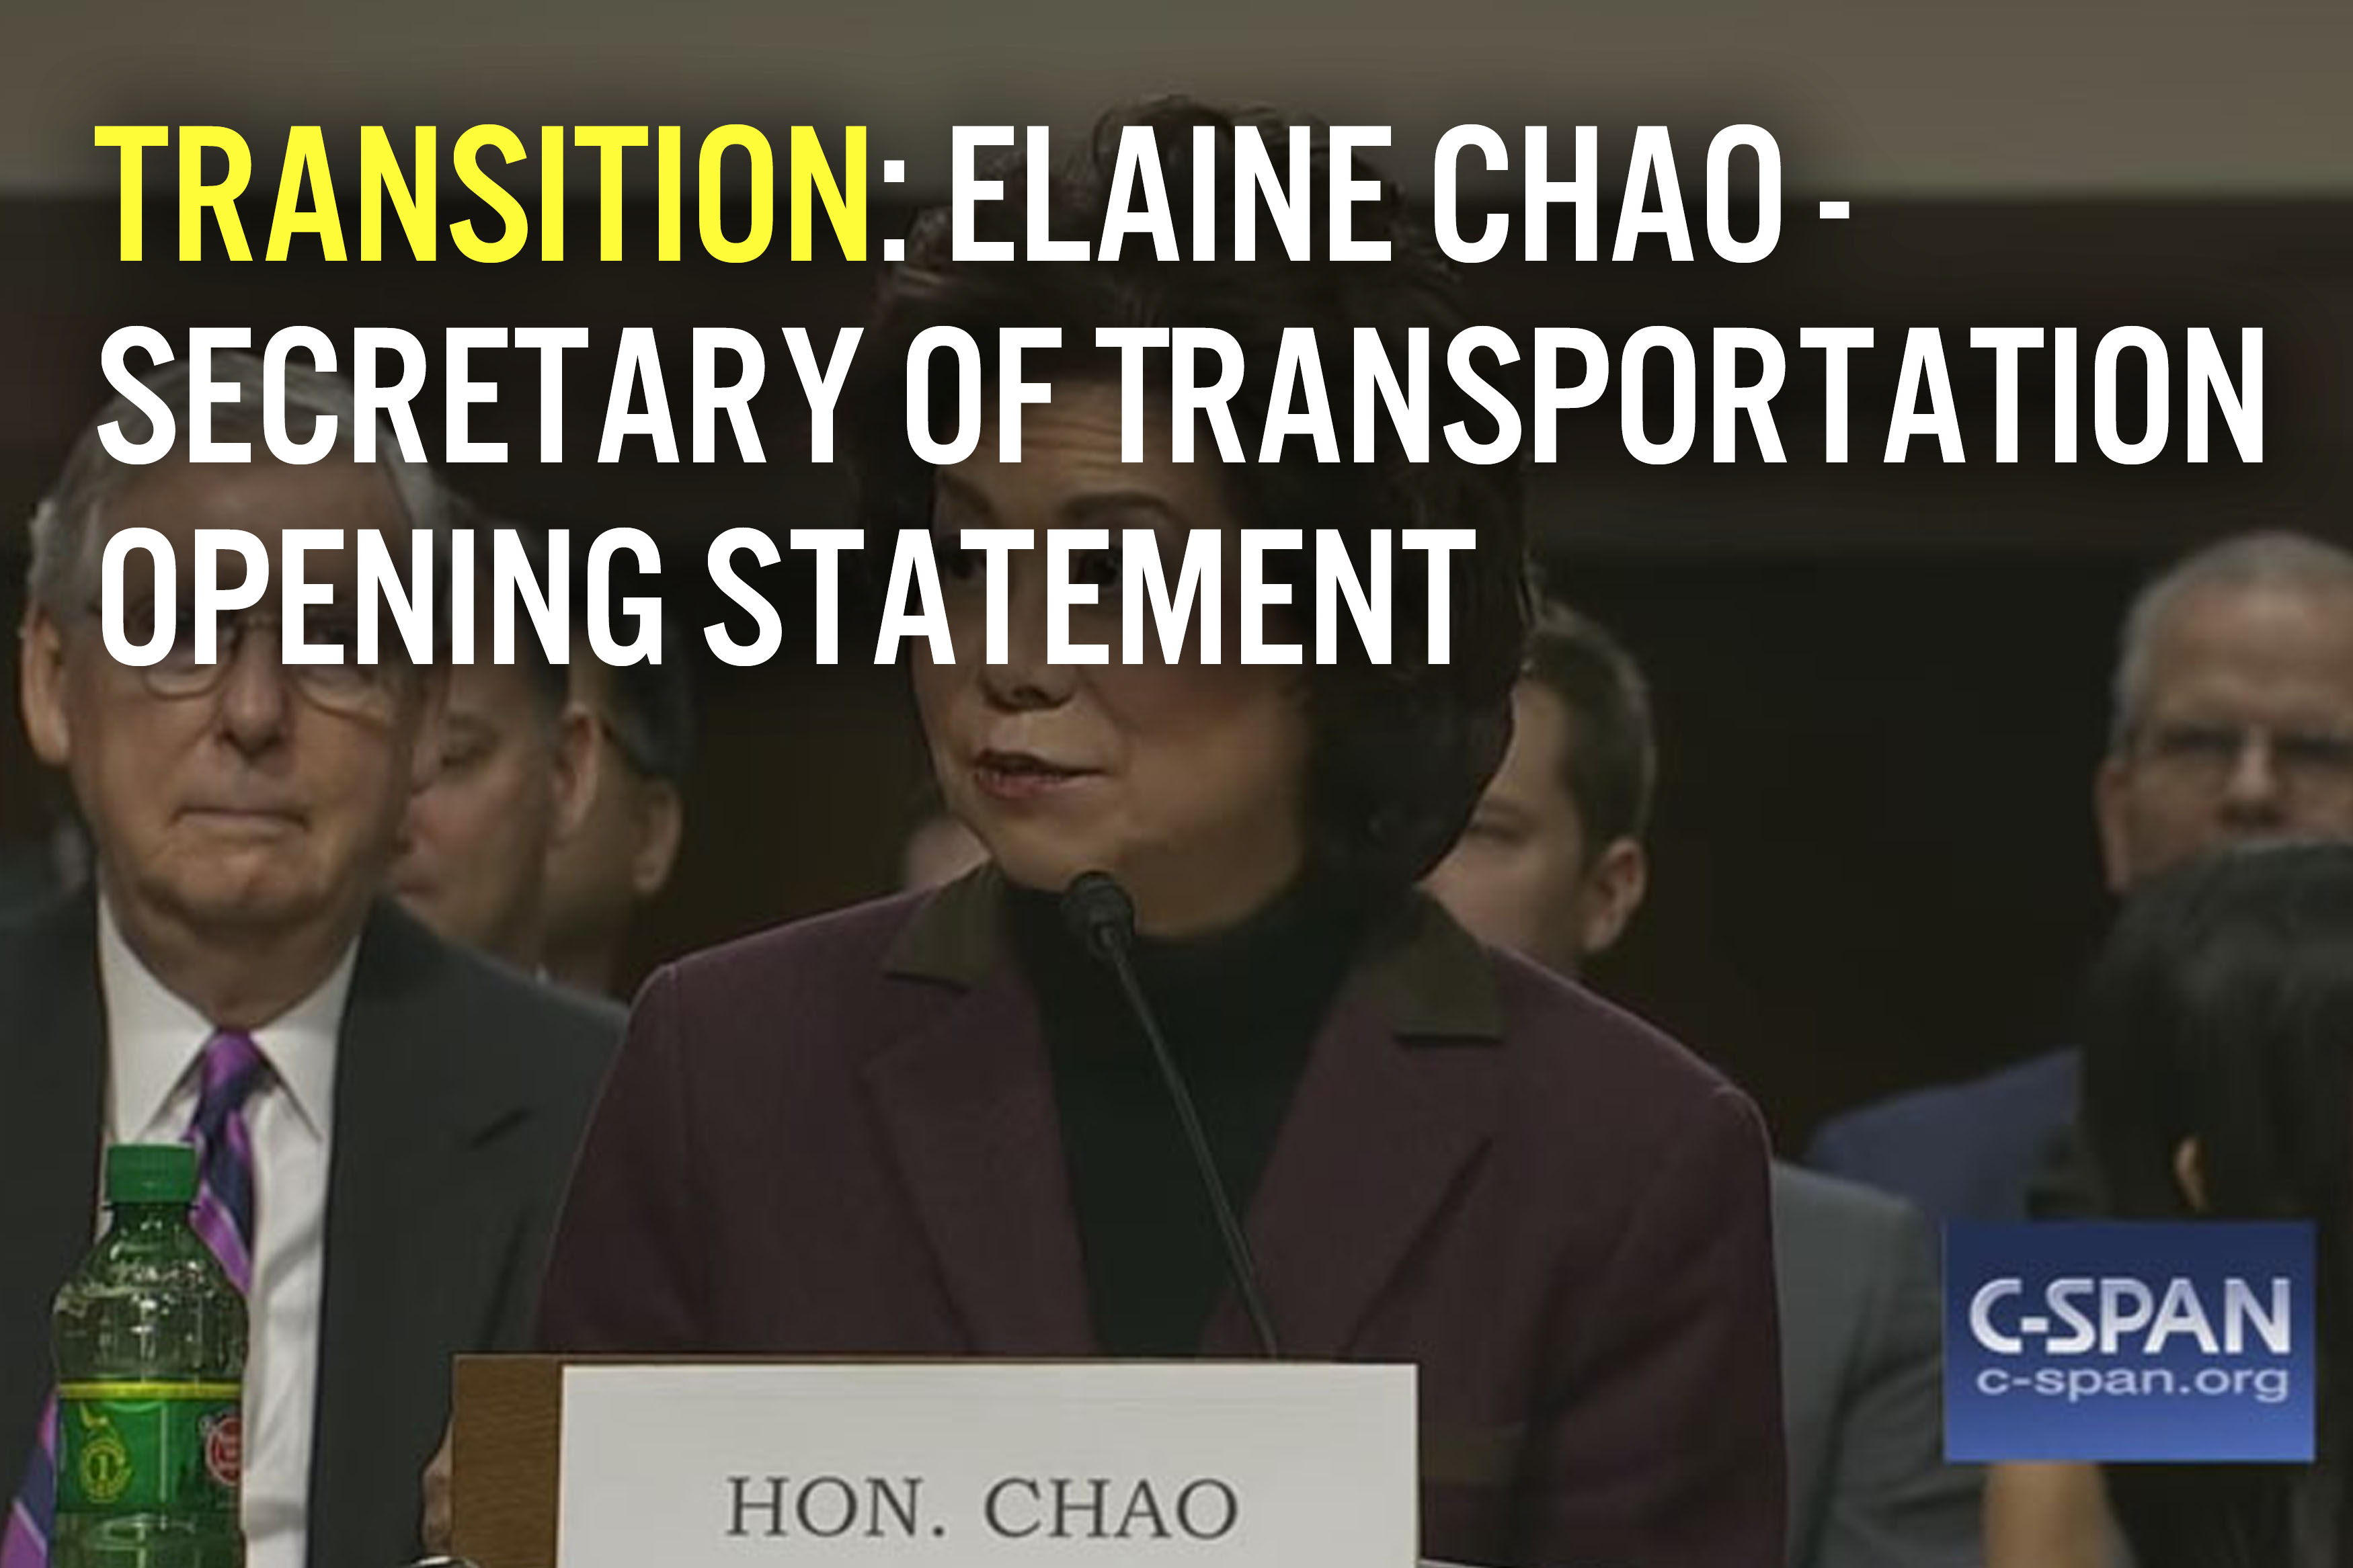 Elaine Chou